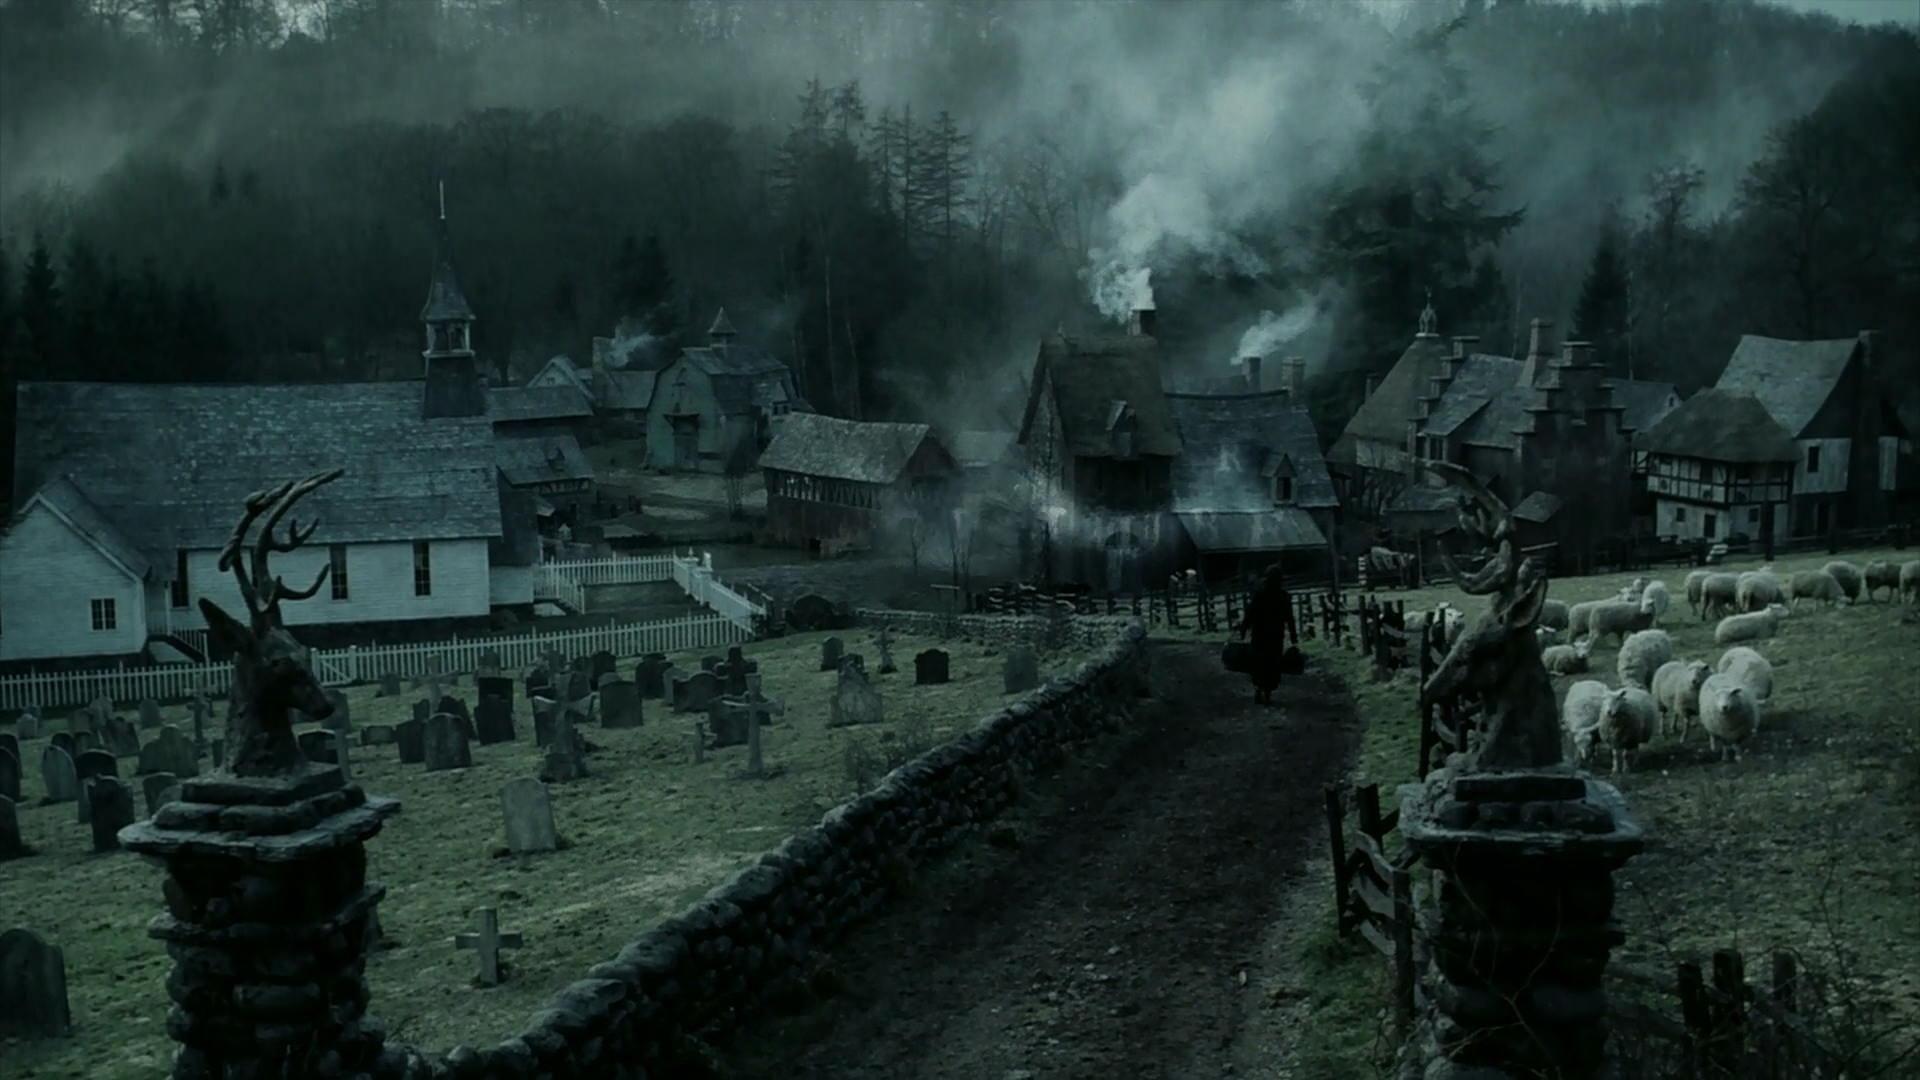 Halloween 2020 Screencaps Sleepy Hollow (1999)   Movie Screencaps.in 2020 | Sleepy